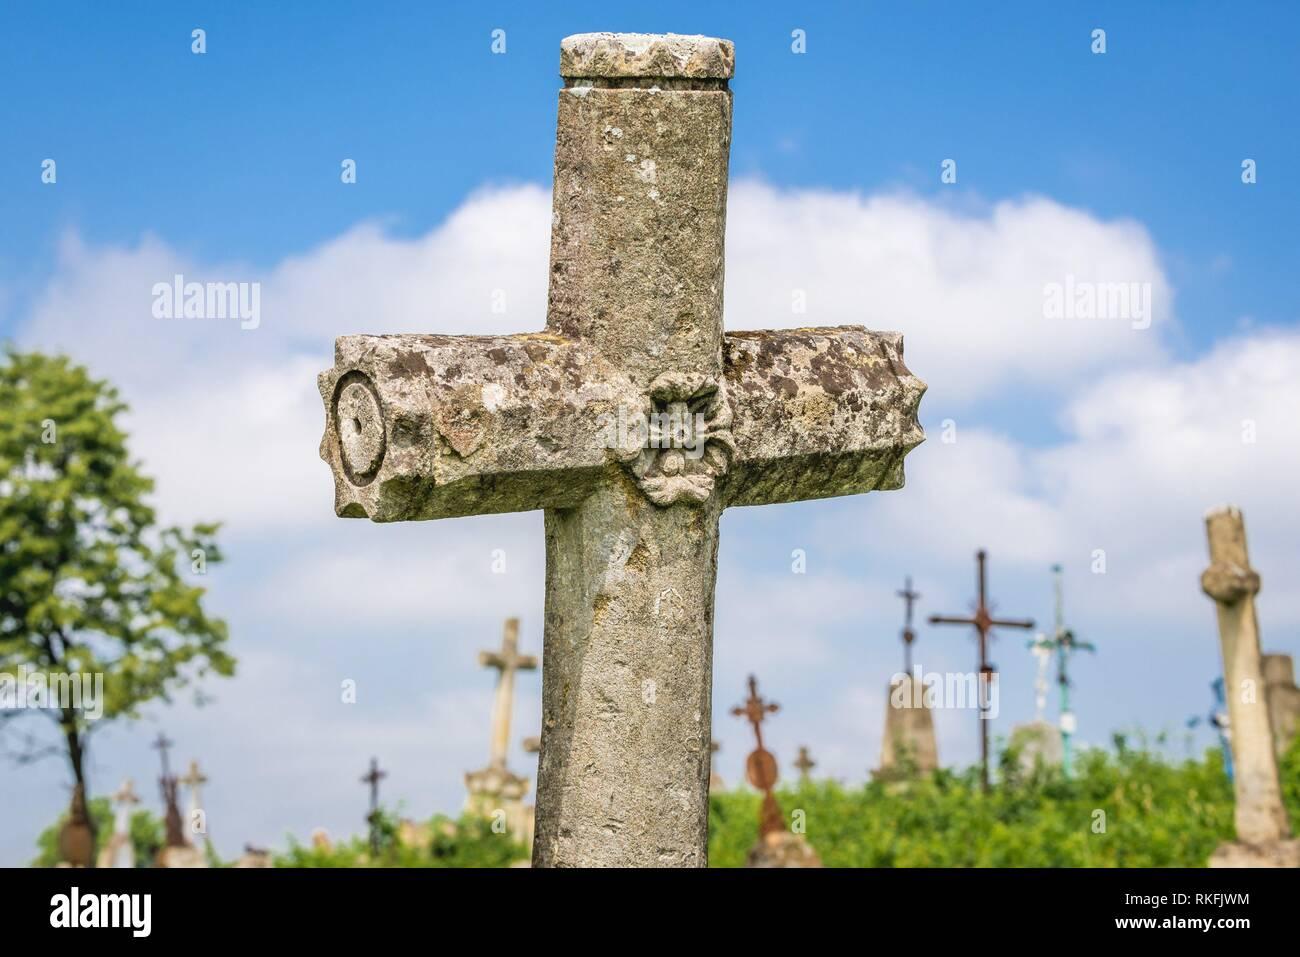 Abandoned cemetery near ruined castle in former Chervonohorod village in Zalischyky region, Ternopil Province, Ukraine. - Stock Image